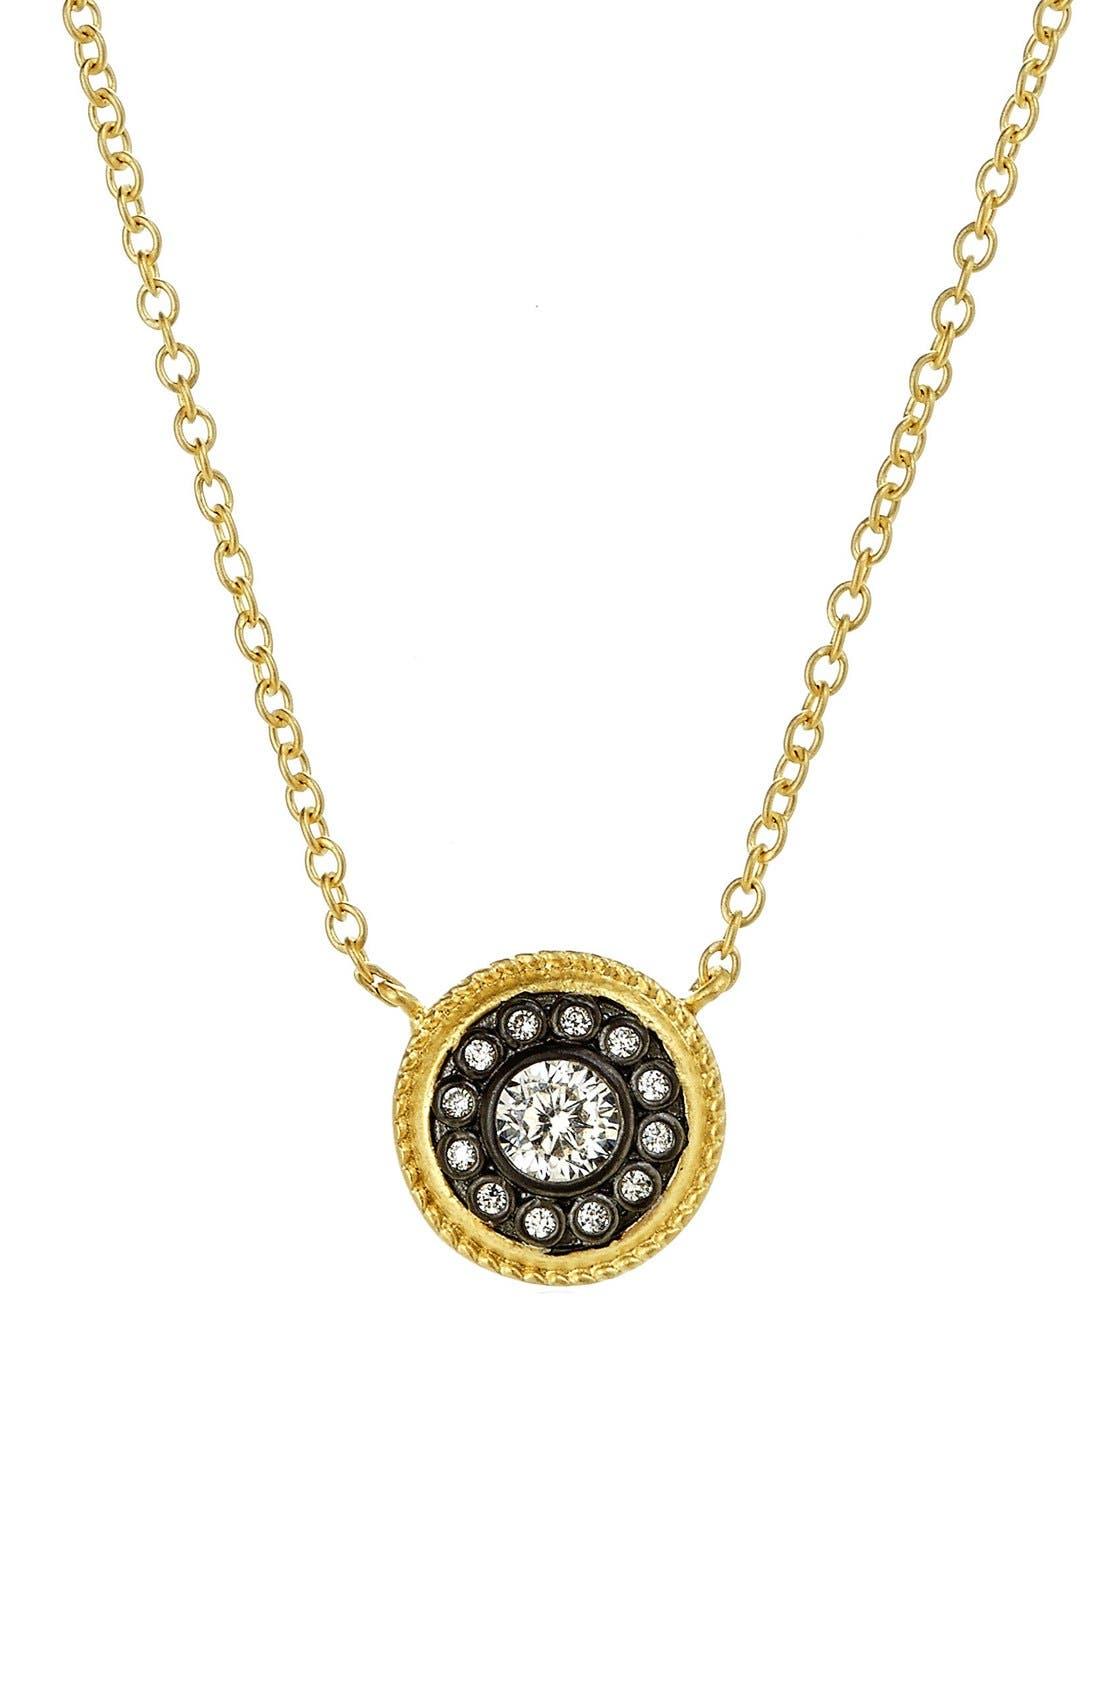 Alternate Image 1 Selected - FREIDA ROTHMAN 'Hamptons' Nautical Button Pendant Necklace